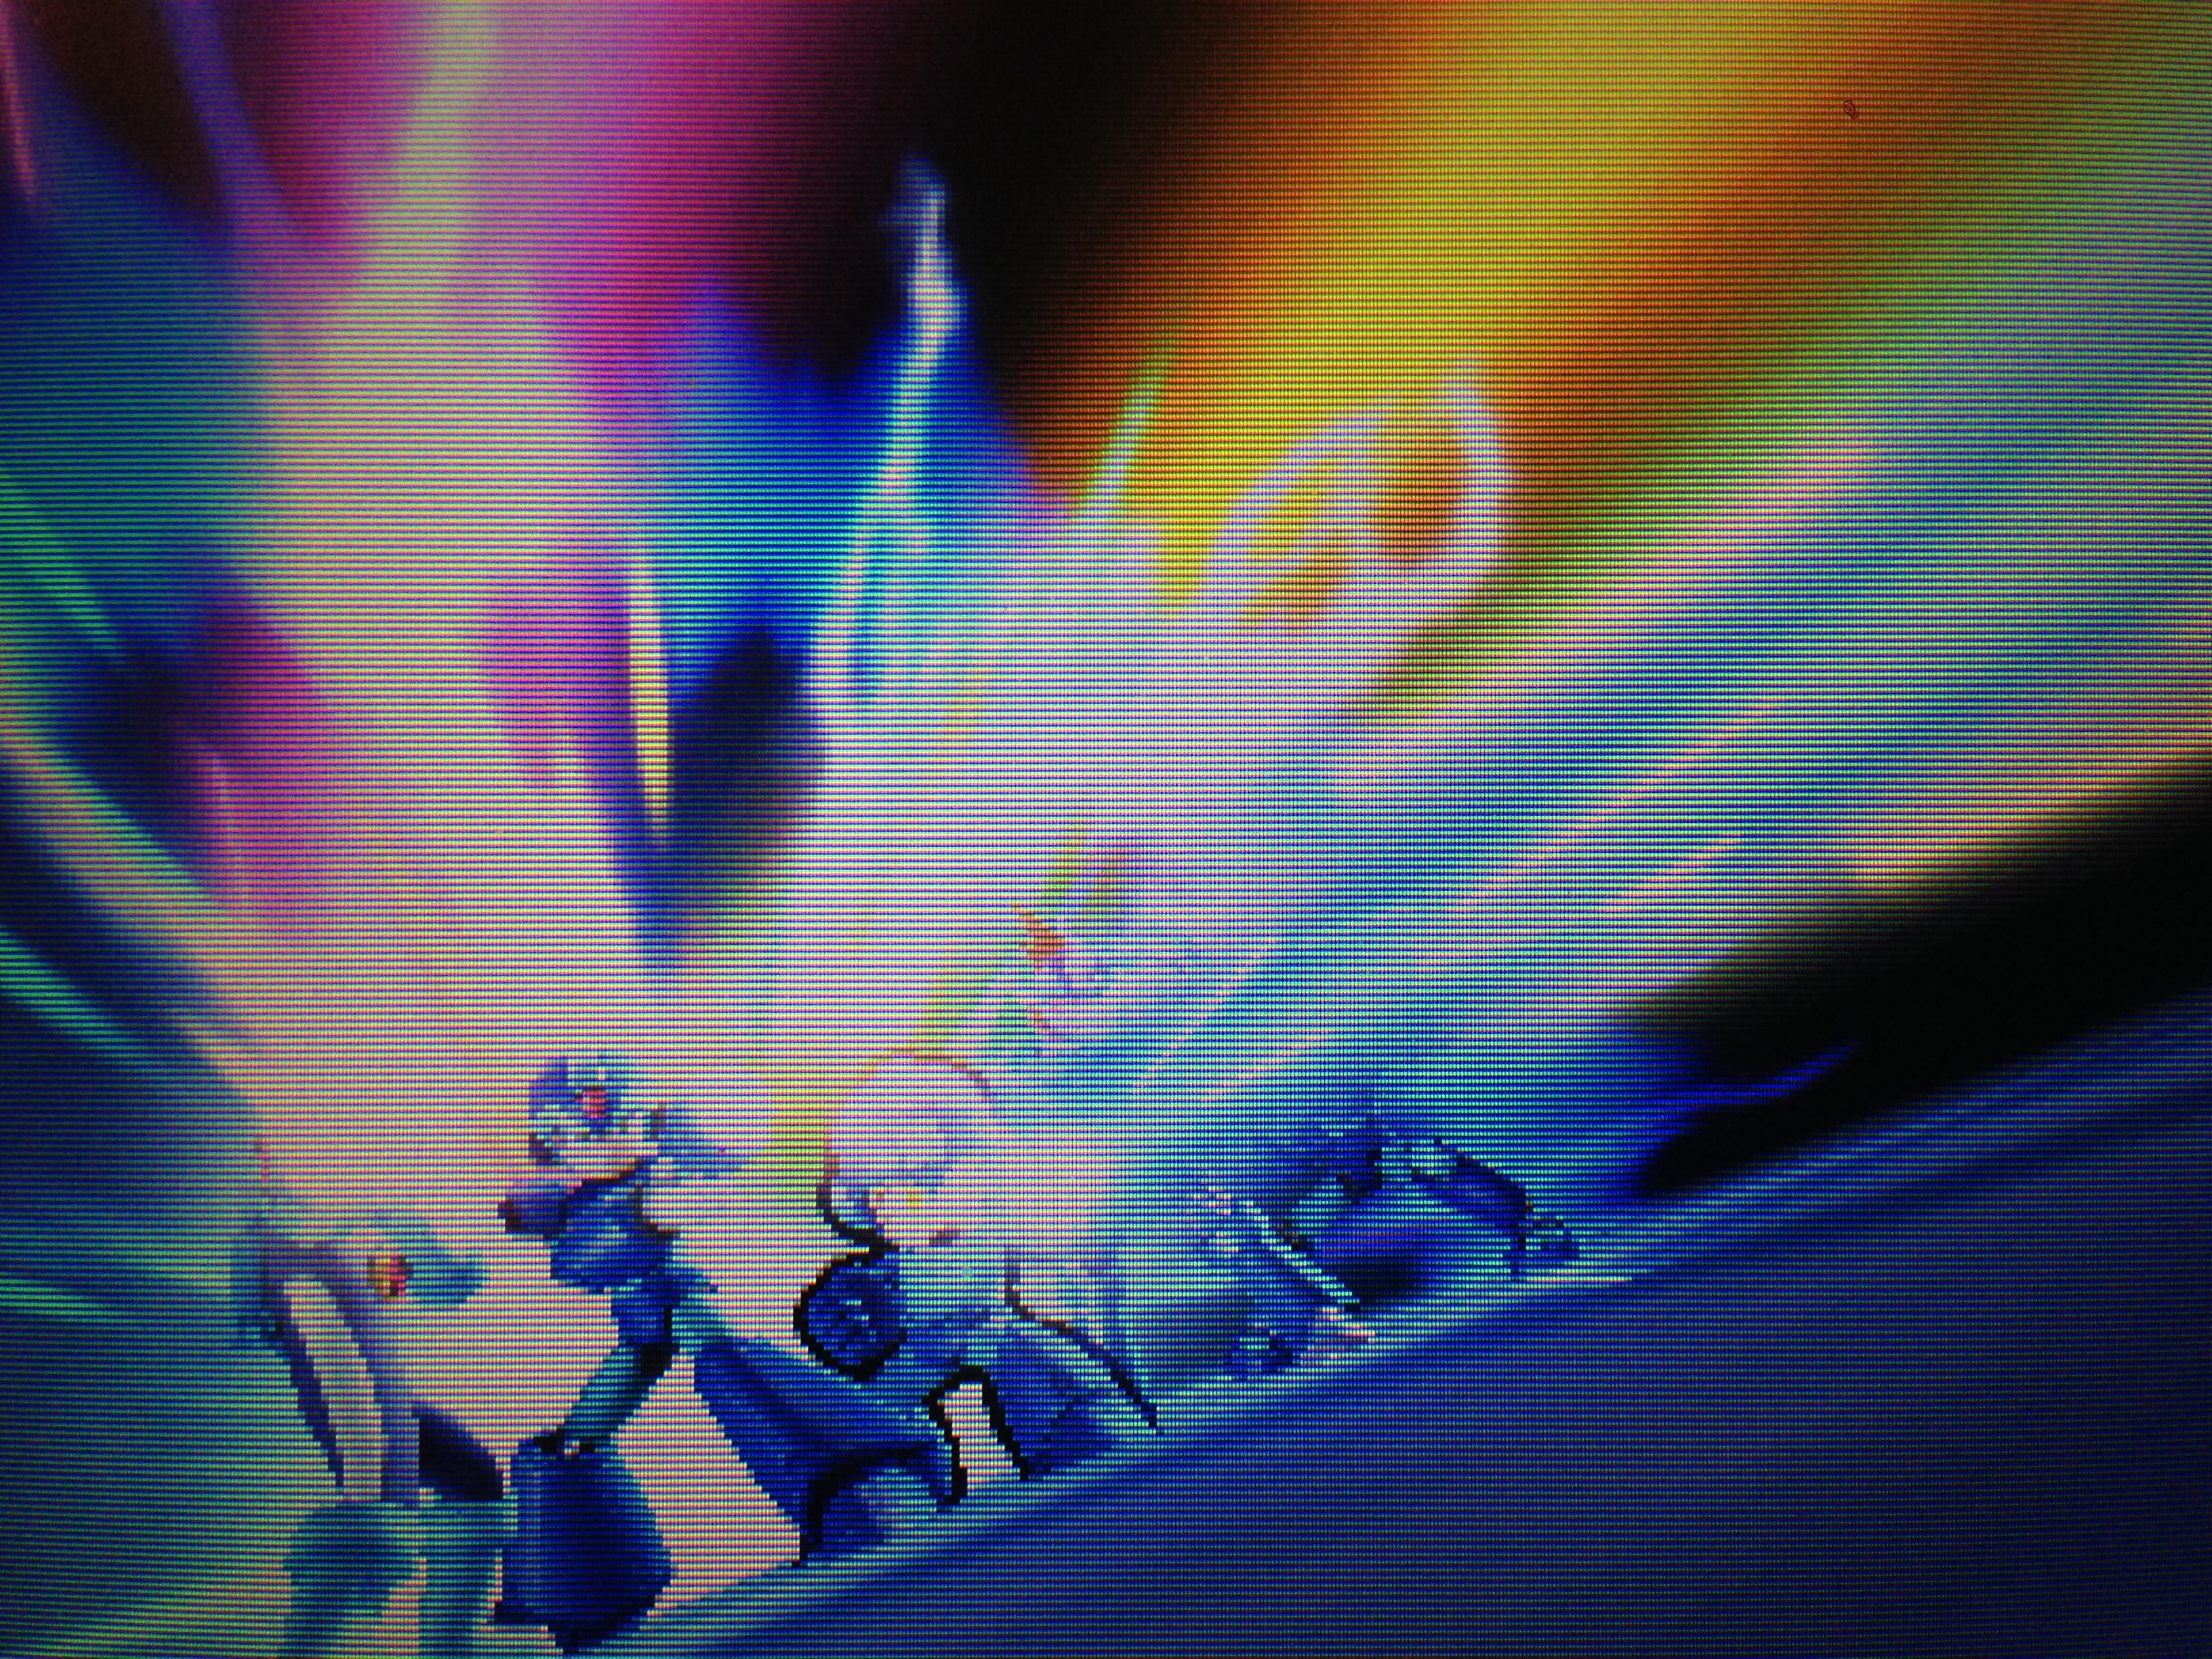 Mega Man's final smash